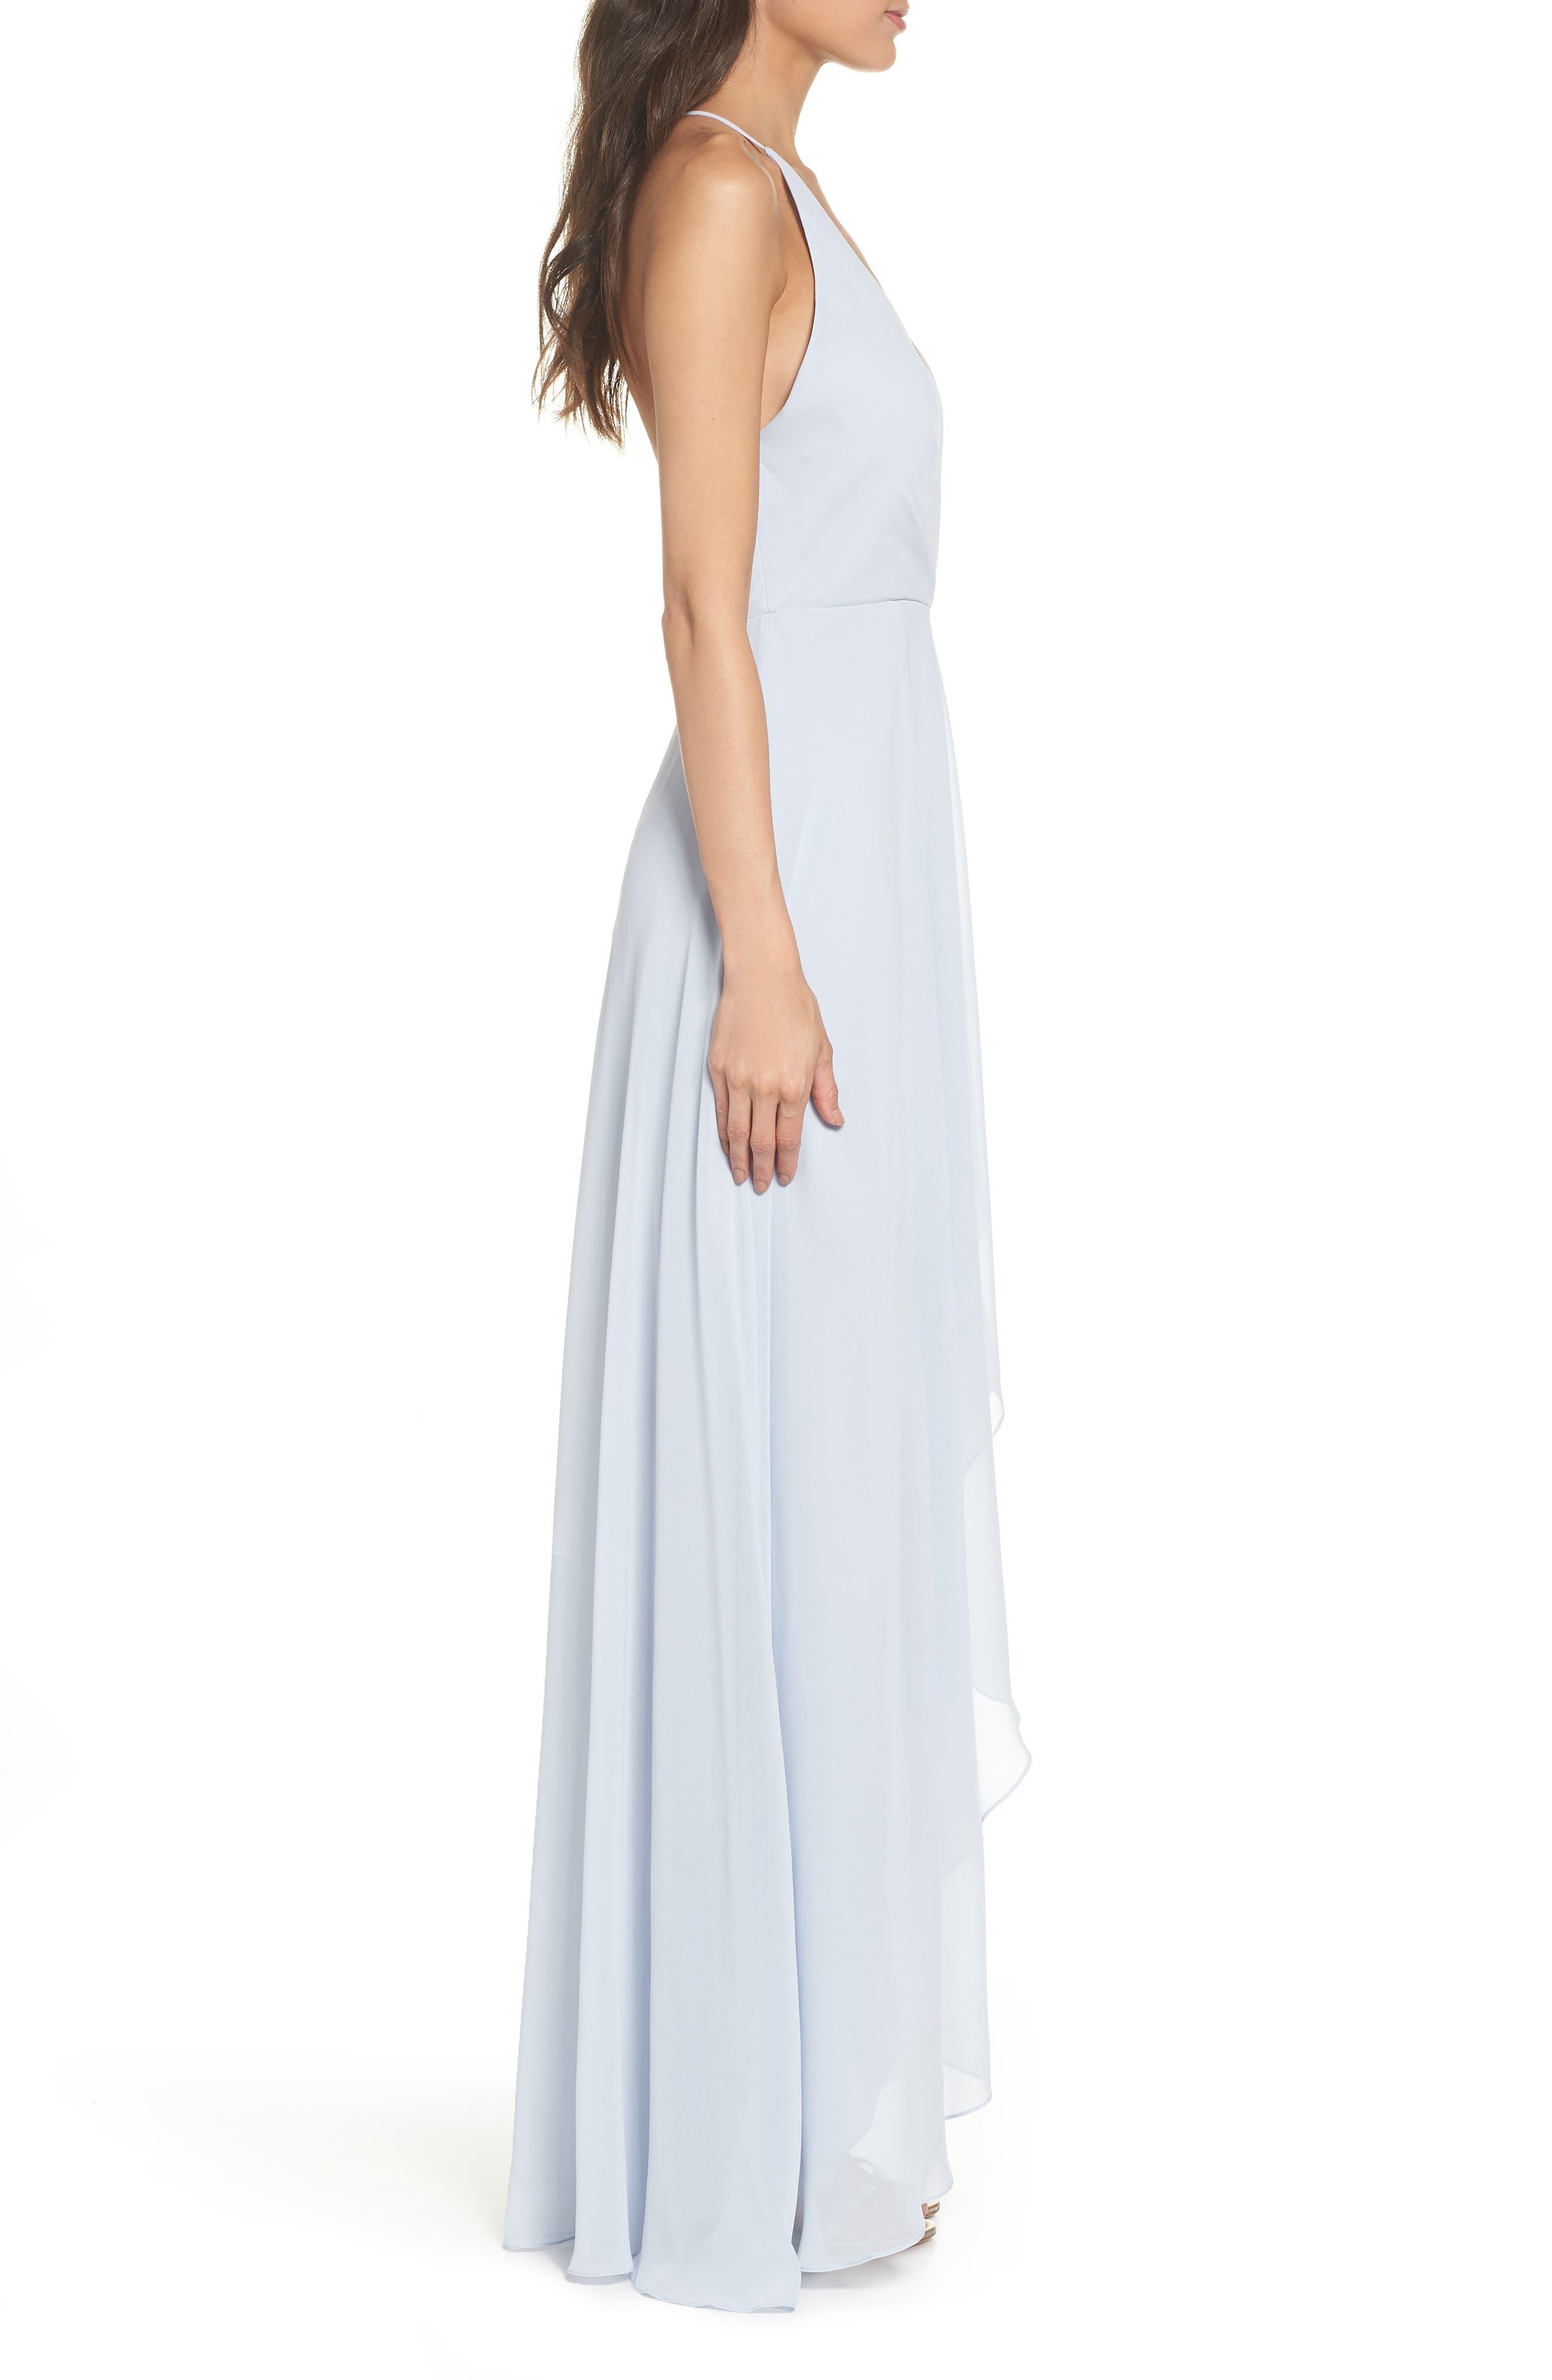 JENNY YOO, Farrah Ruffle Chiffon Gown, Alternate thumbnail 4, color, WHISPER BLUE